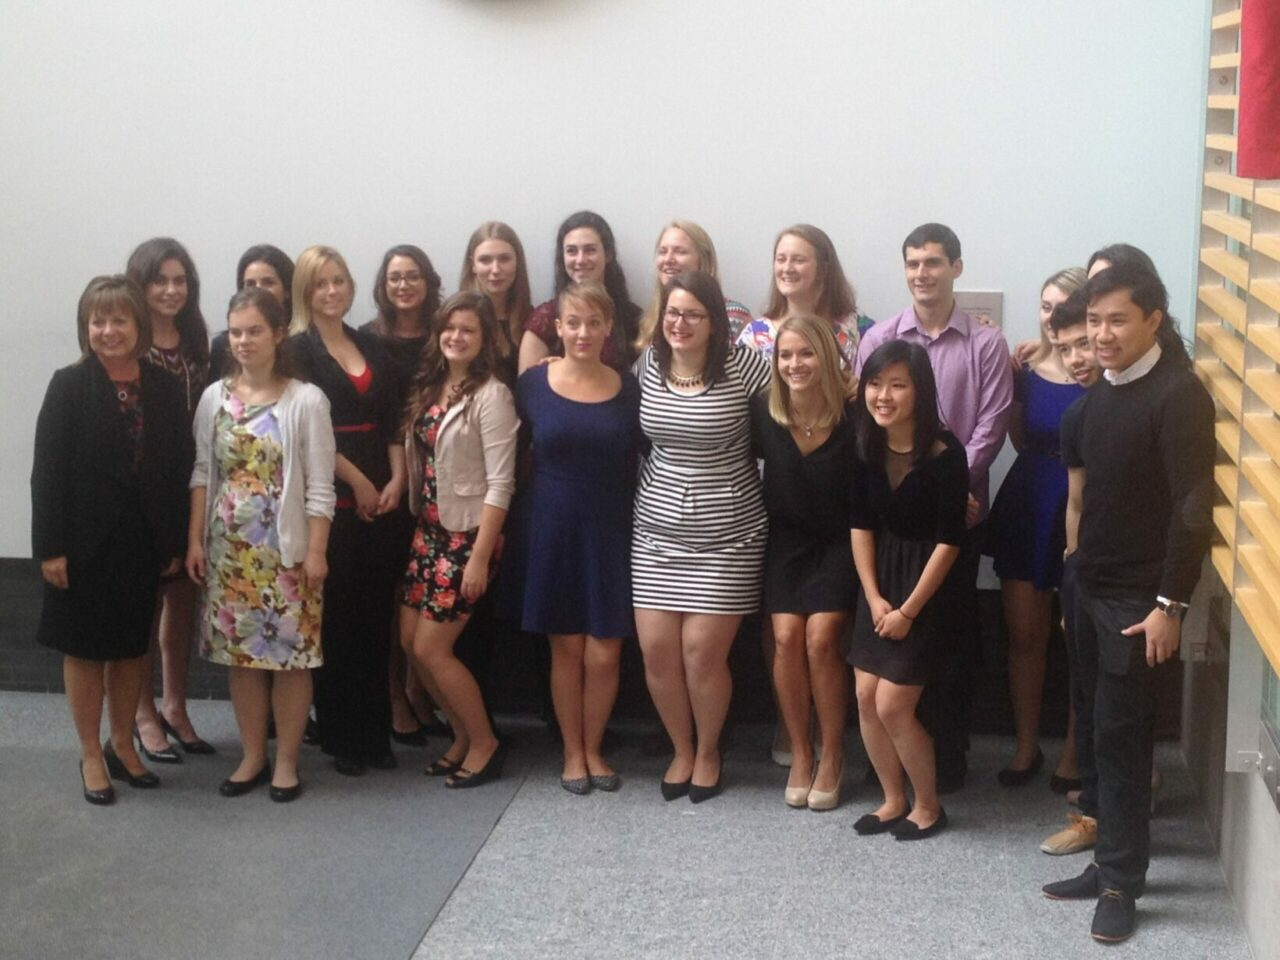 Nursing graduates and staff at the Ingram School of Nursing reception.